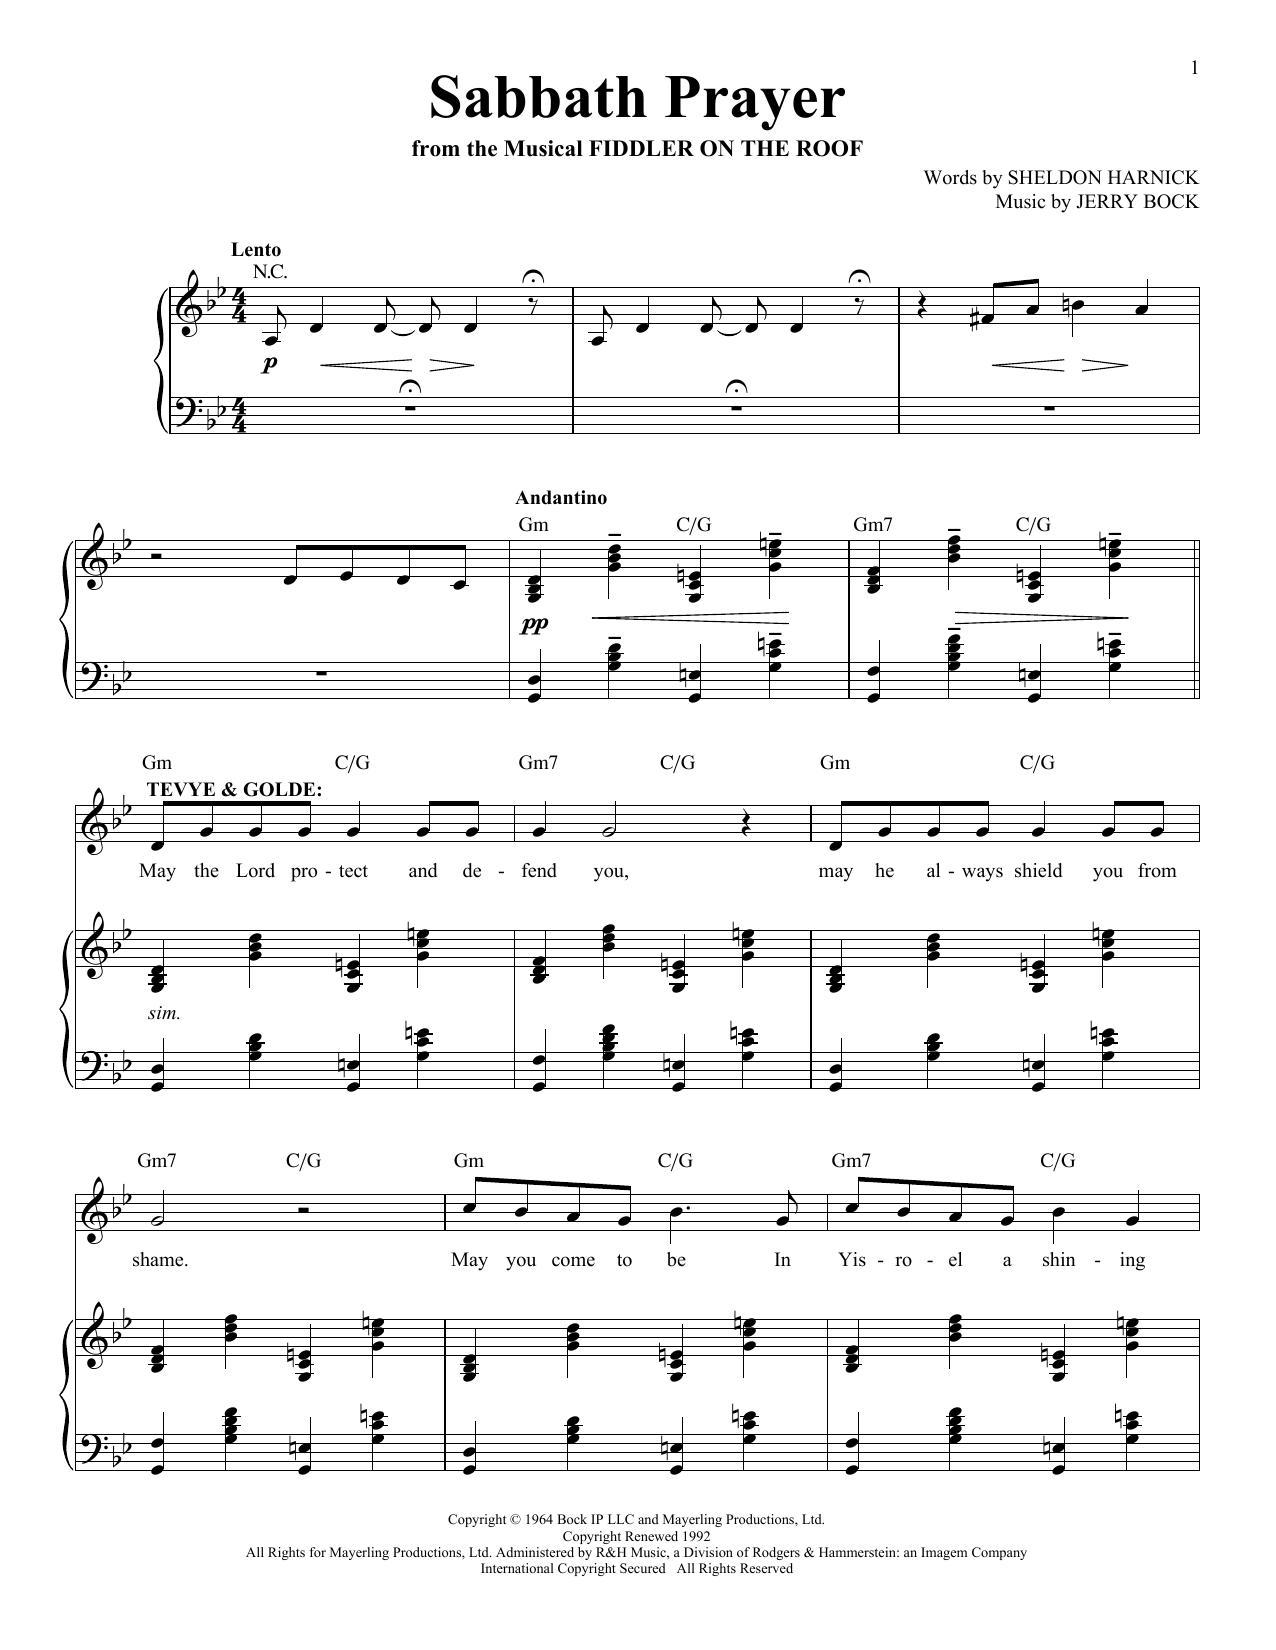 Jerry Bock Sabbath Prayer sheet music notes and chords. Download Printable PDF.